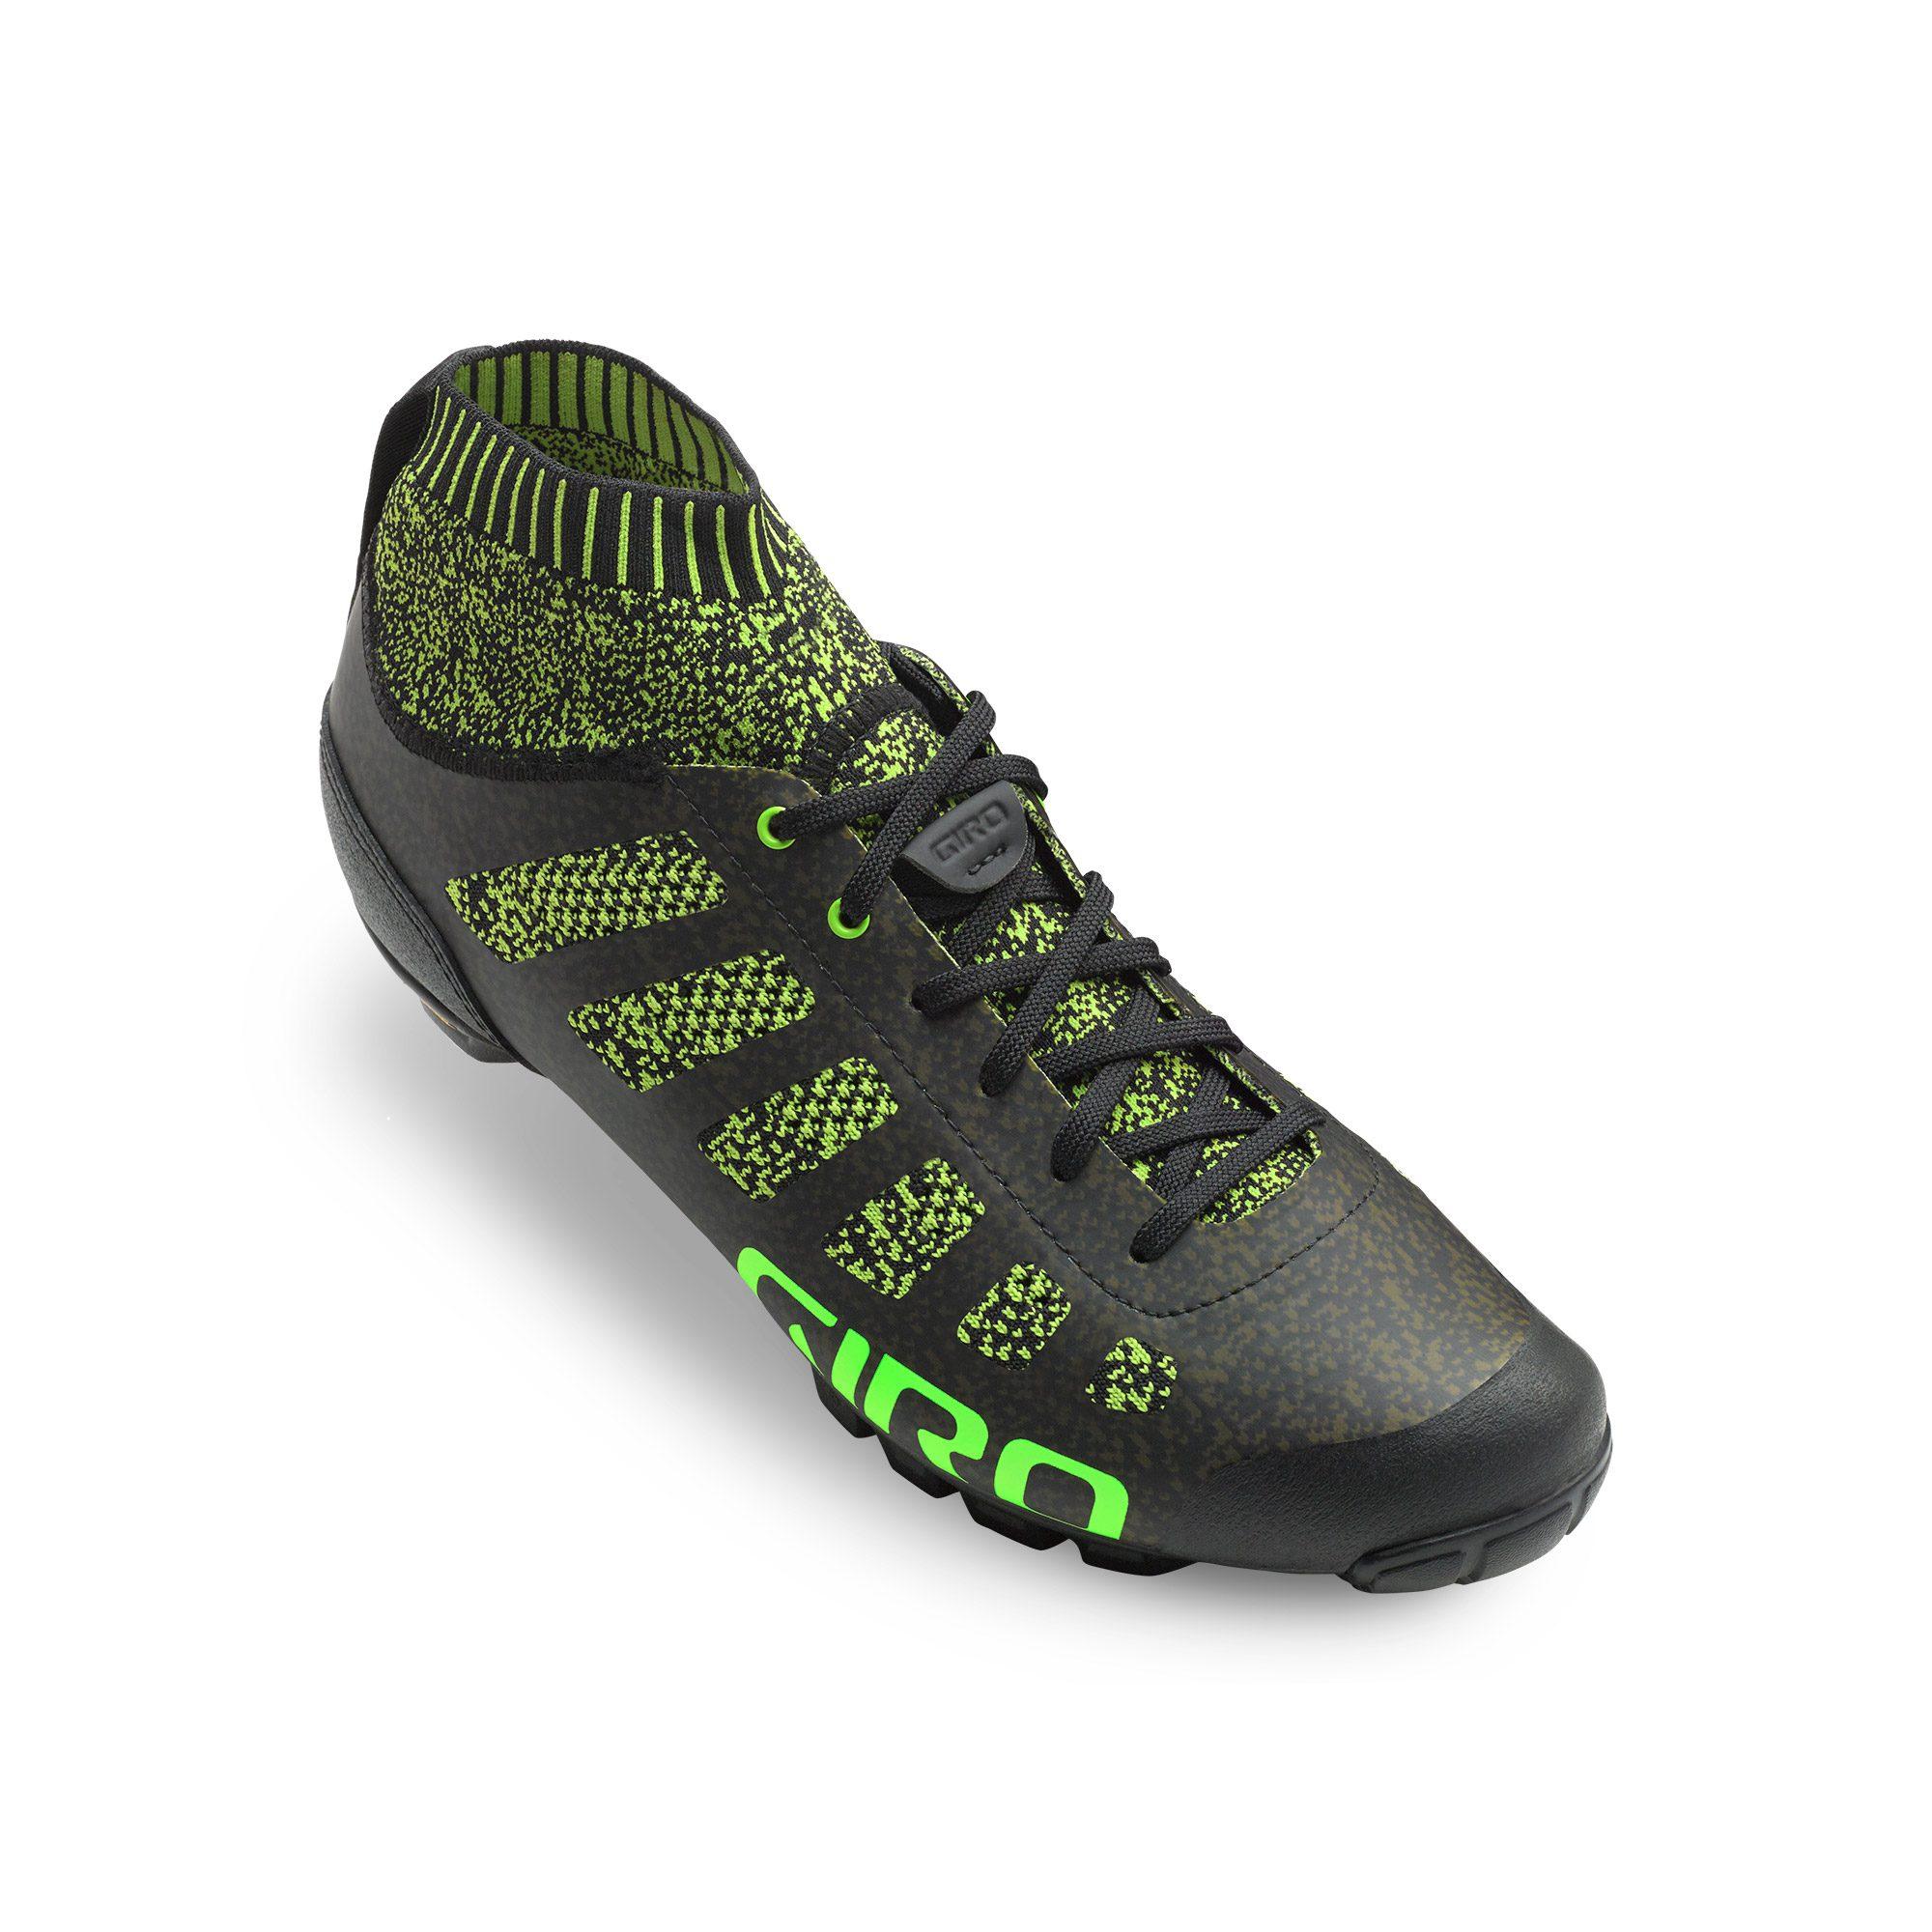 Giro launches Xnetic™ Knit cycling footwear